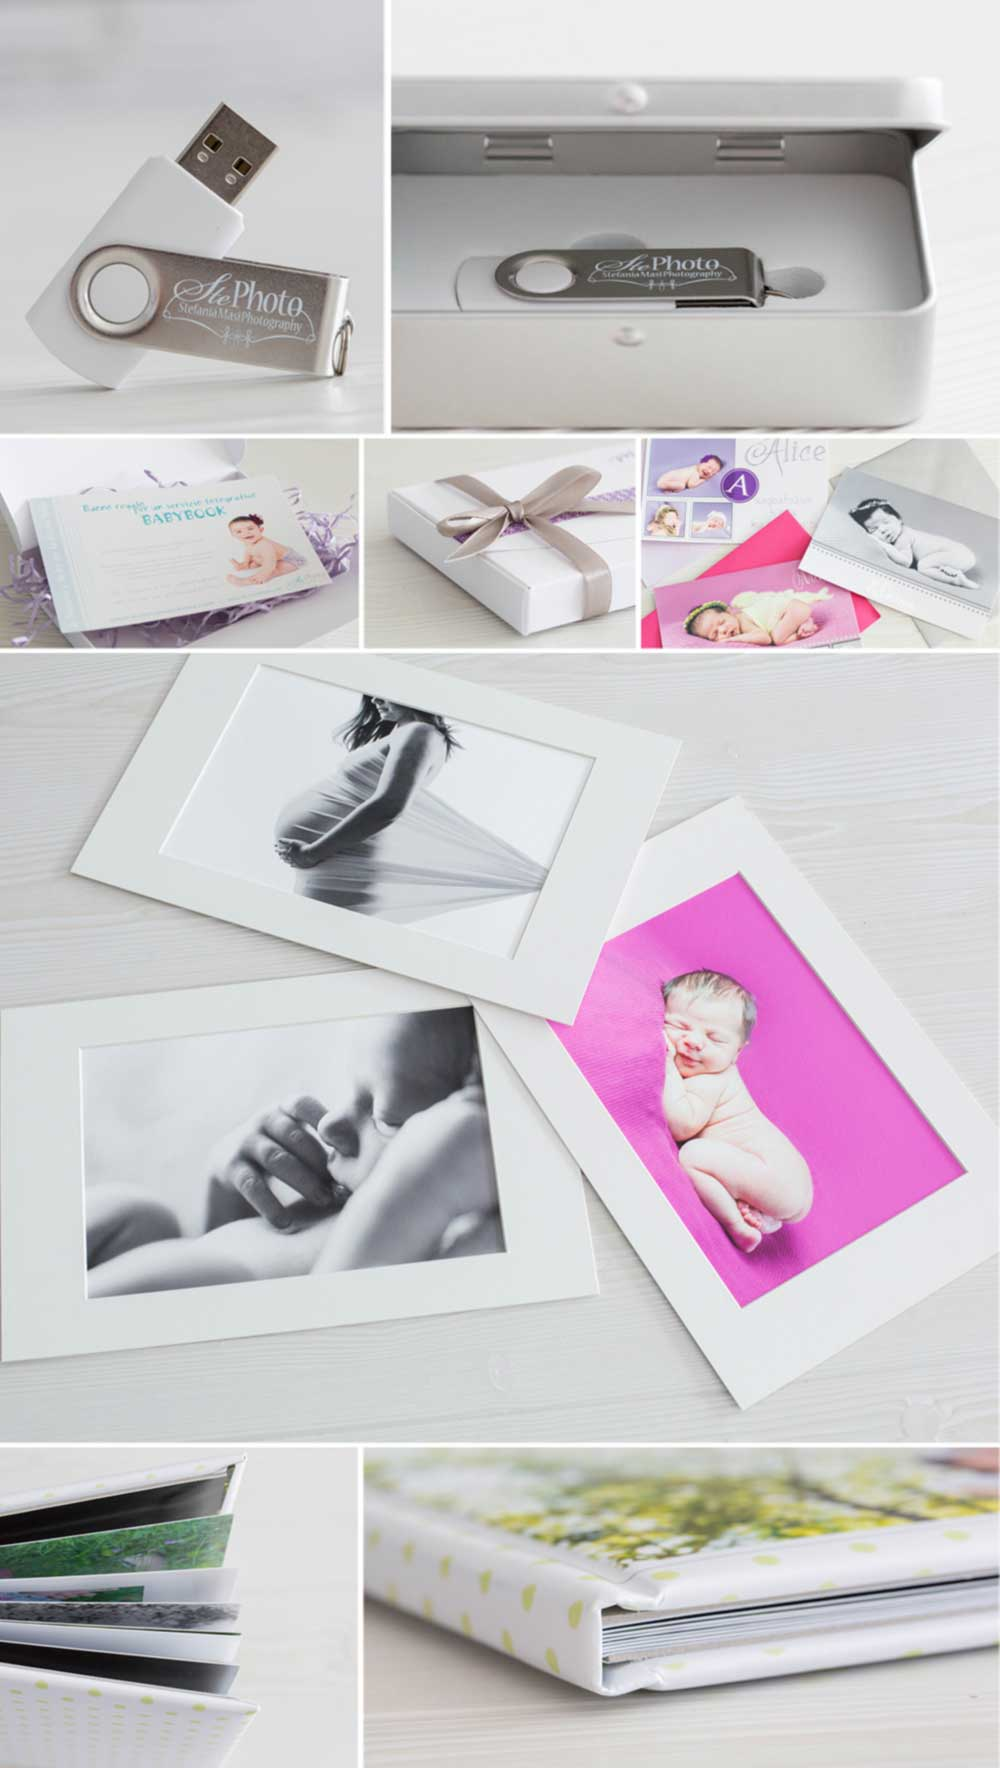 stefania masi fotografa stefoto album e prodotti